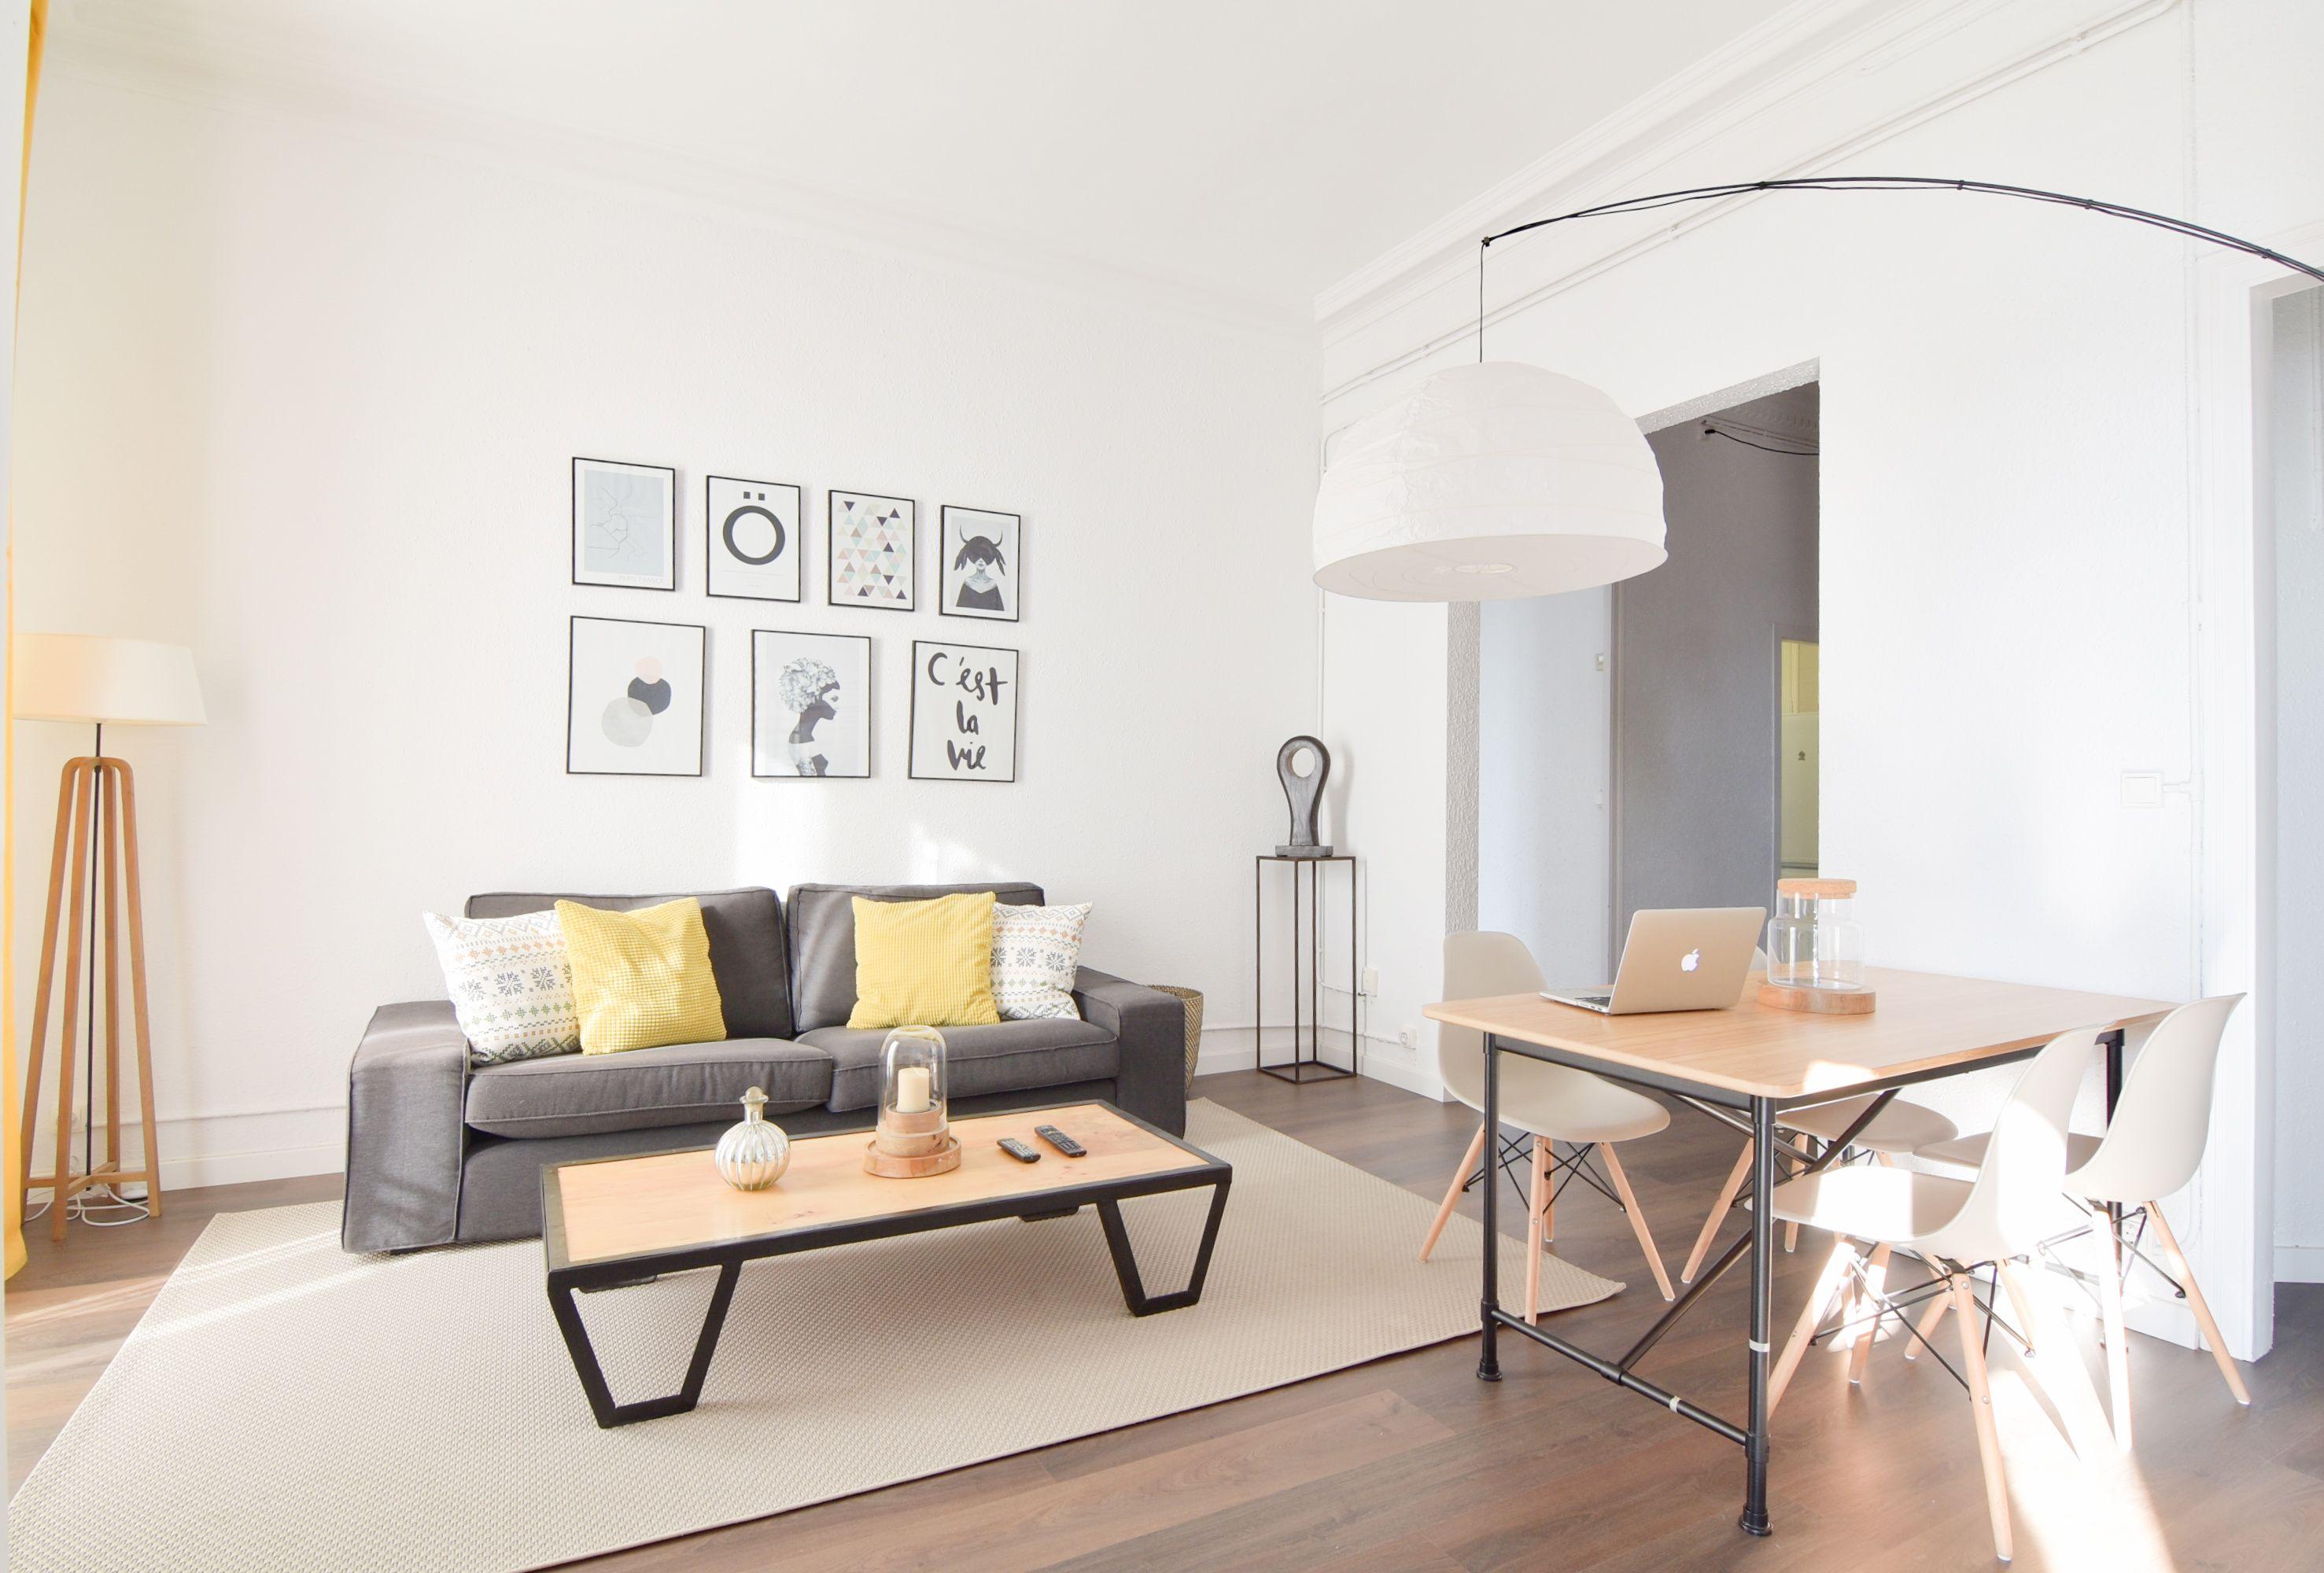 Fotos De Salon Comedor.1 Salon Comedor Living And Dining Room 1840 Apartments